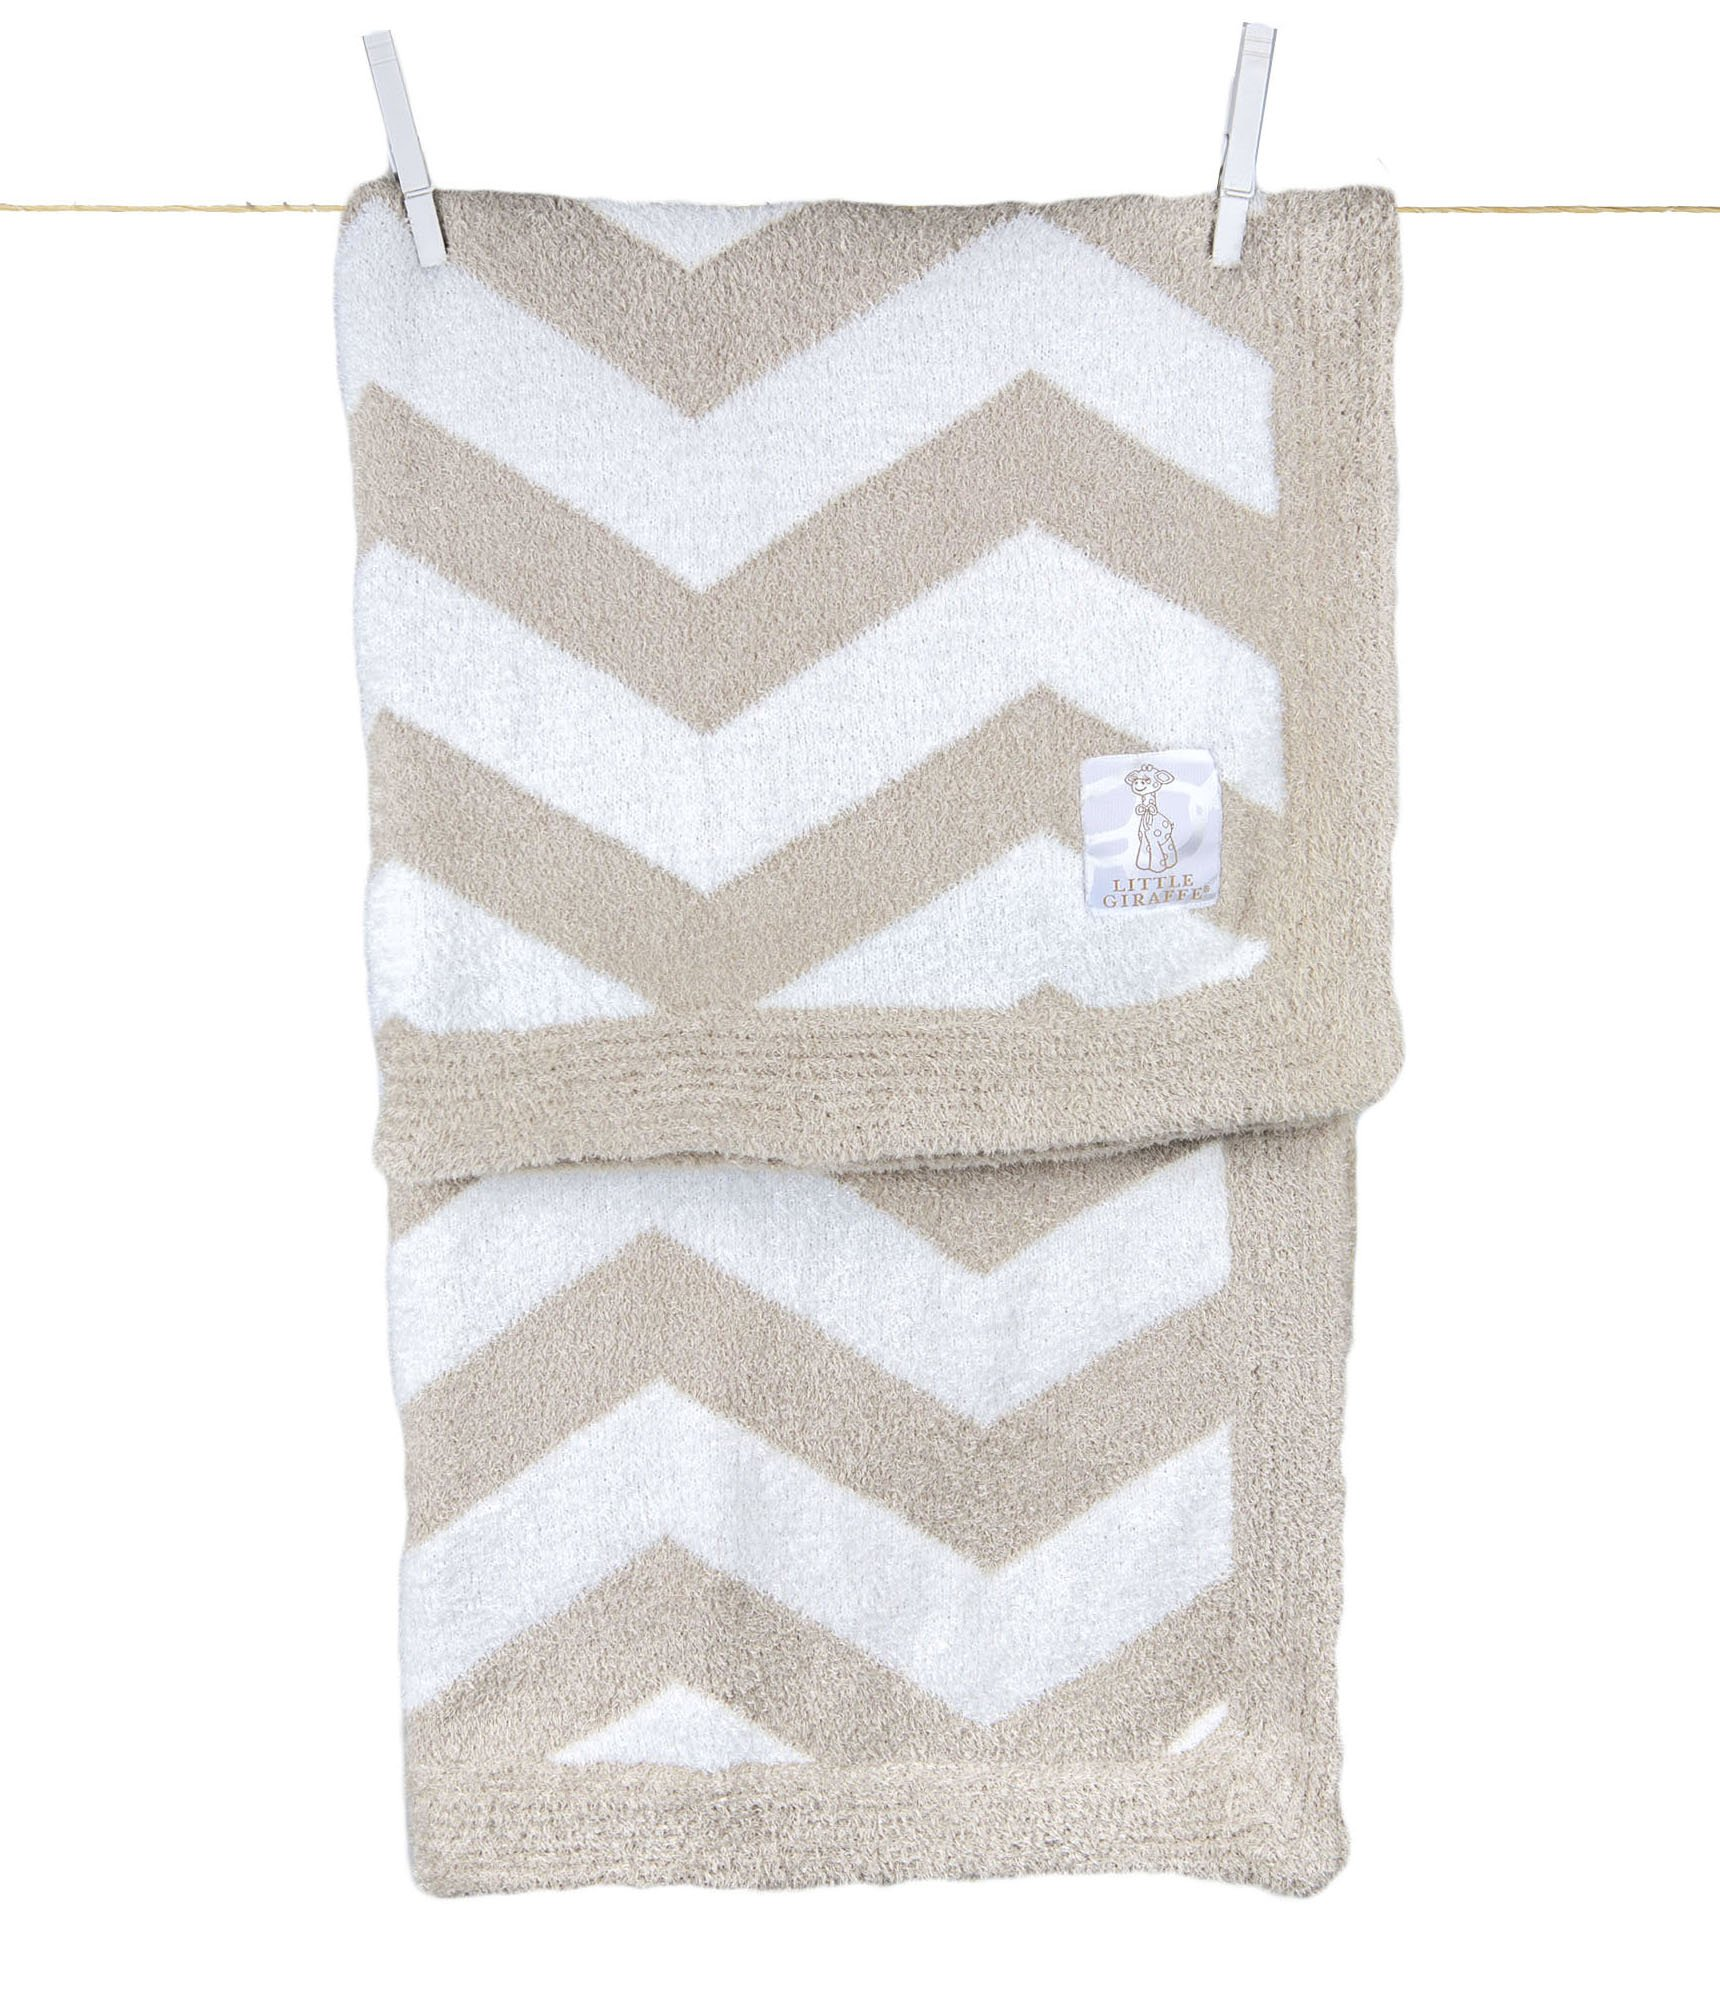 Ritorujirafu Little Giraffe - Dealer imports] Dolce Chevron baby blanket (flux) / BOX containing lg0088-03B